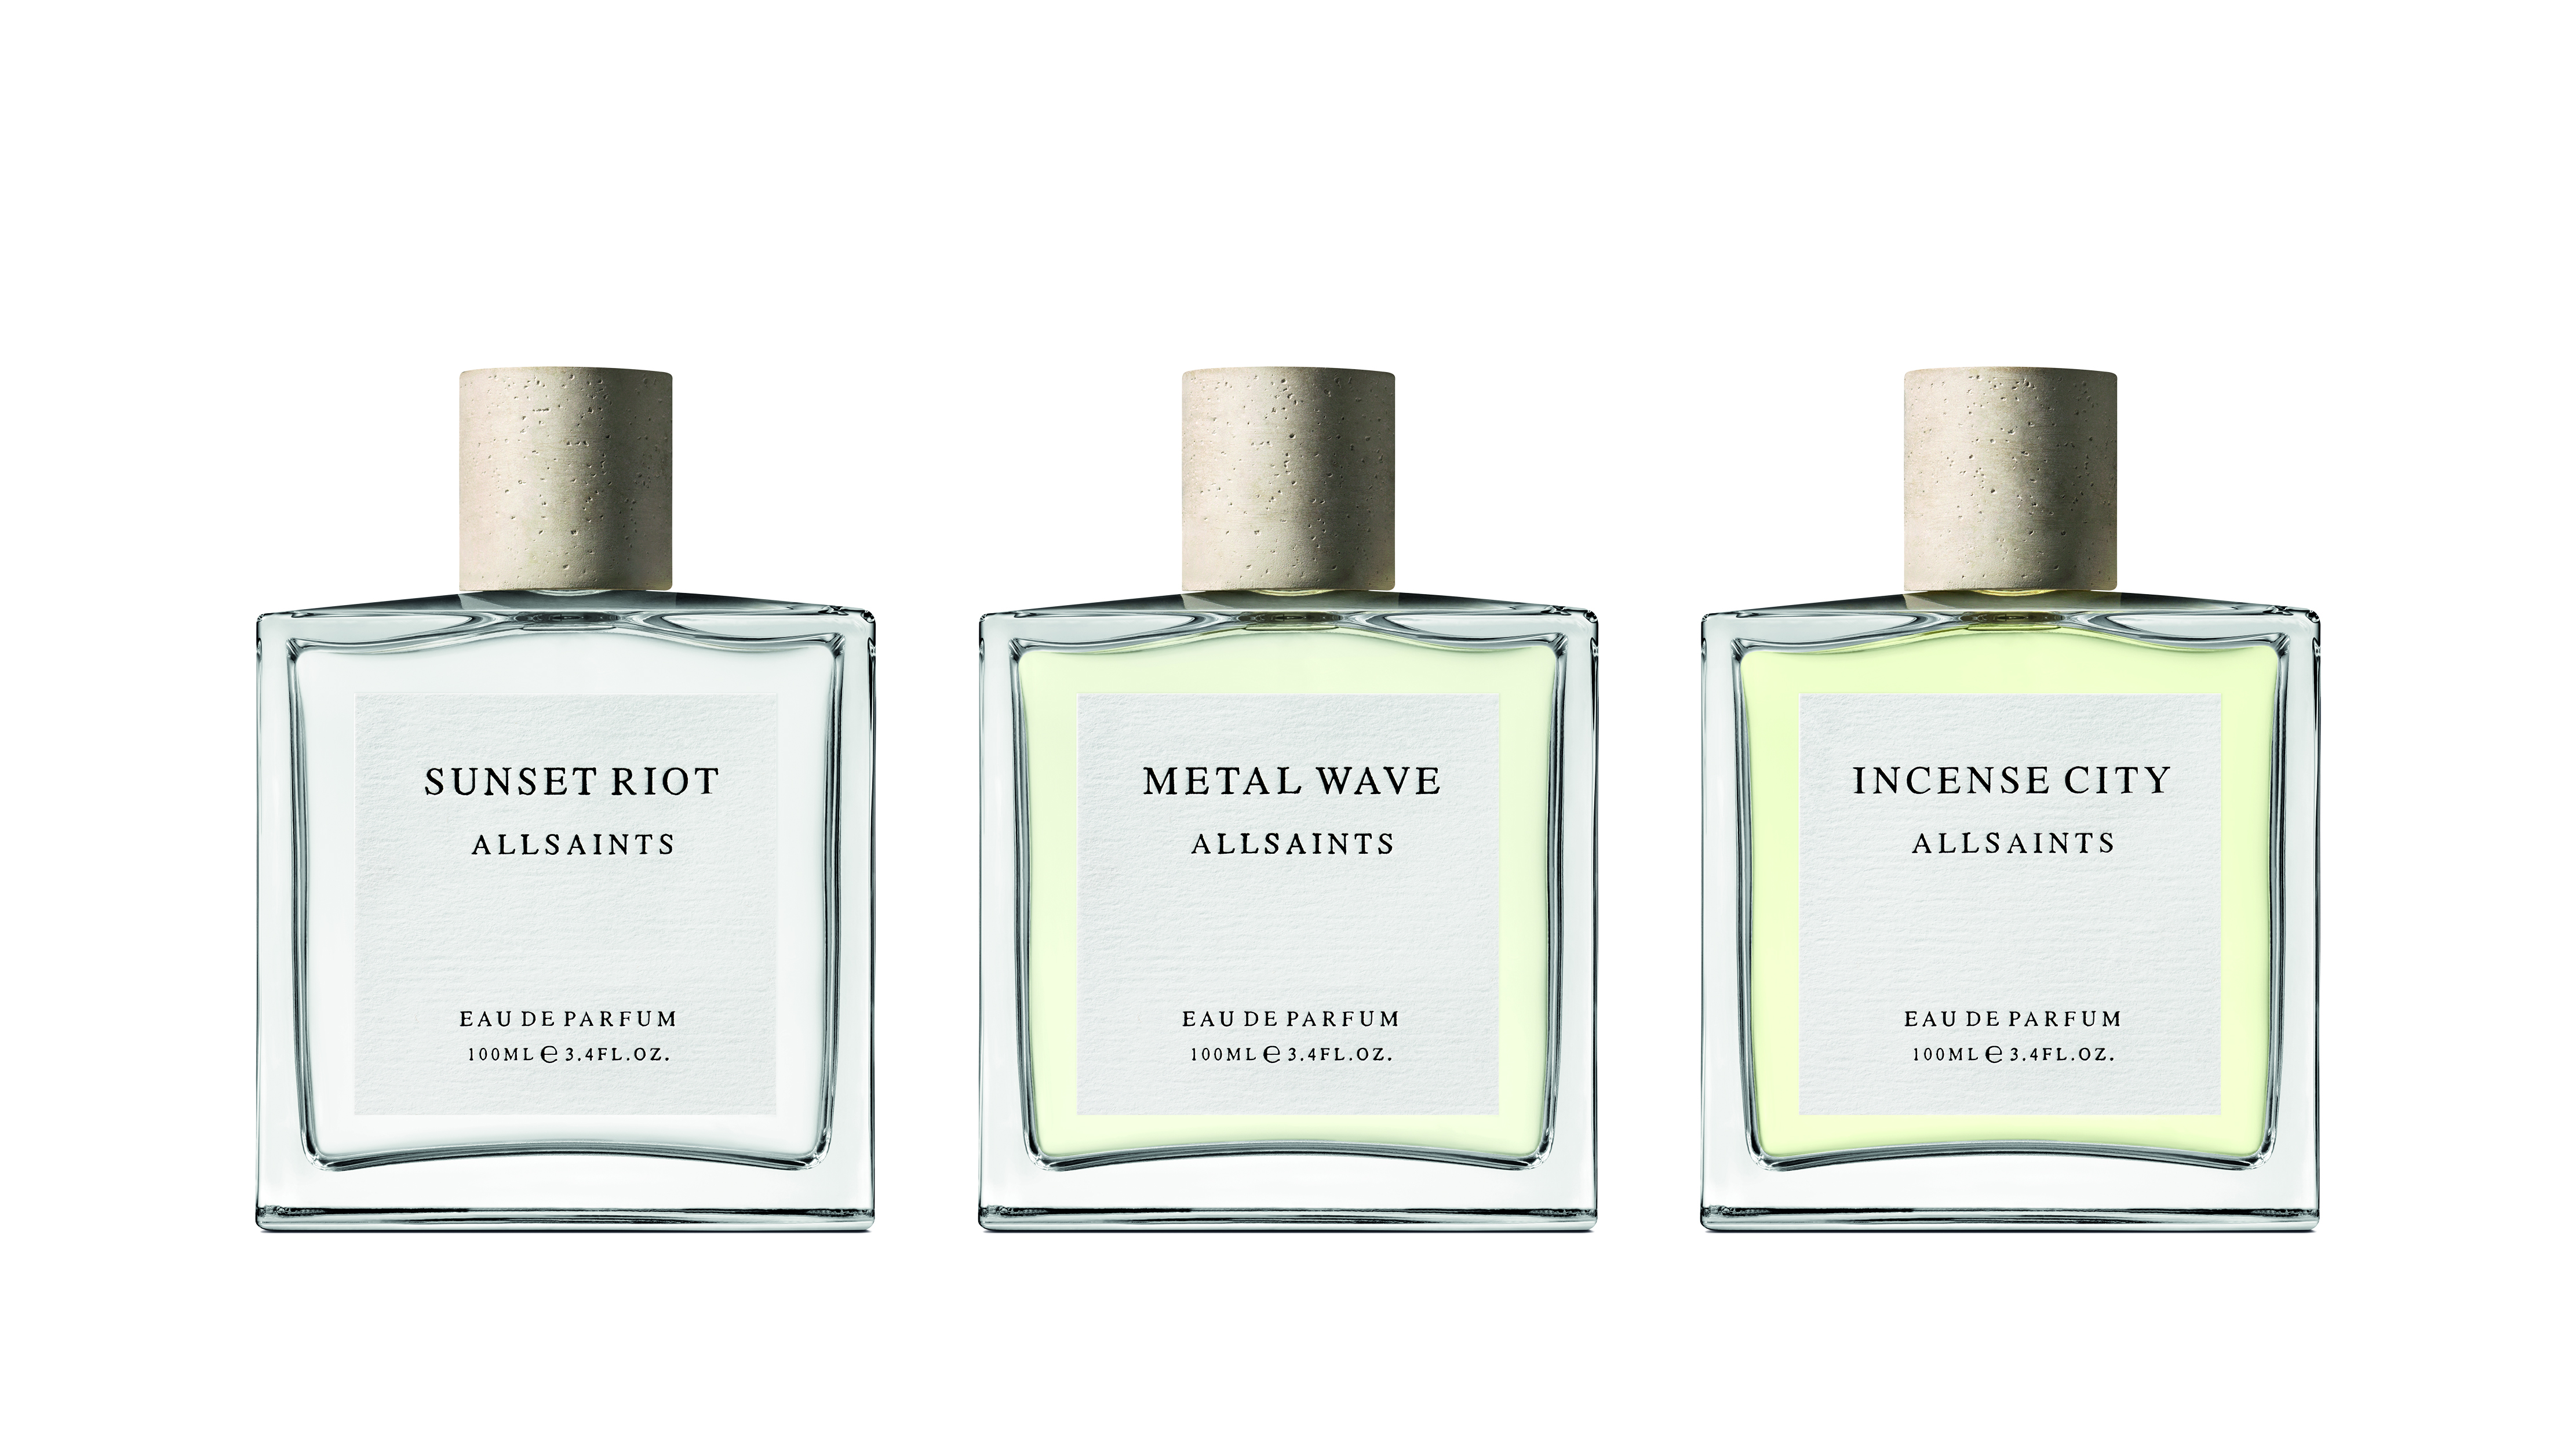 AllSaints fragrance collection